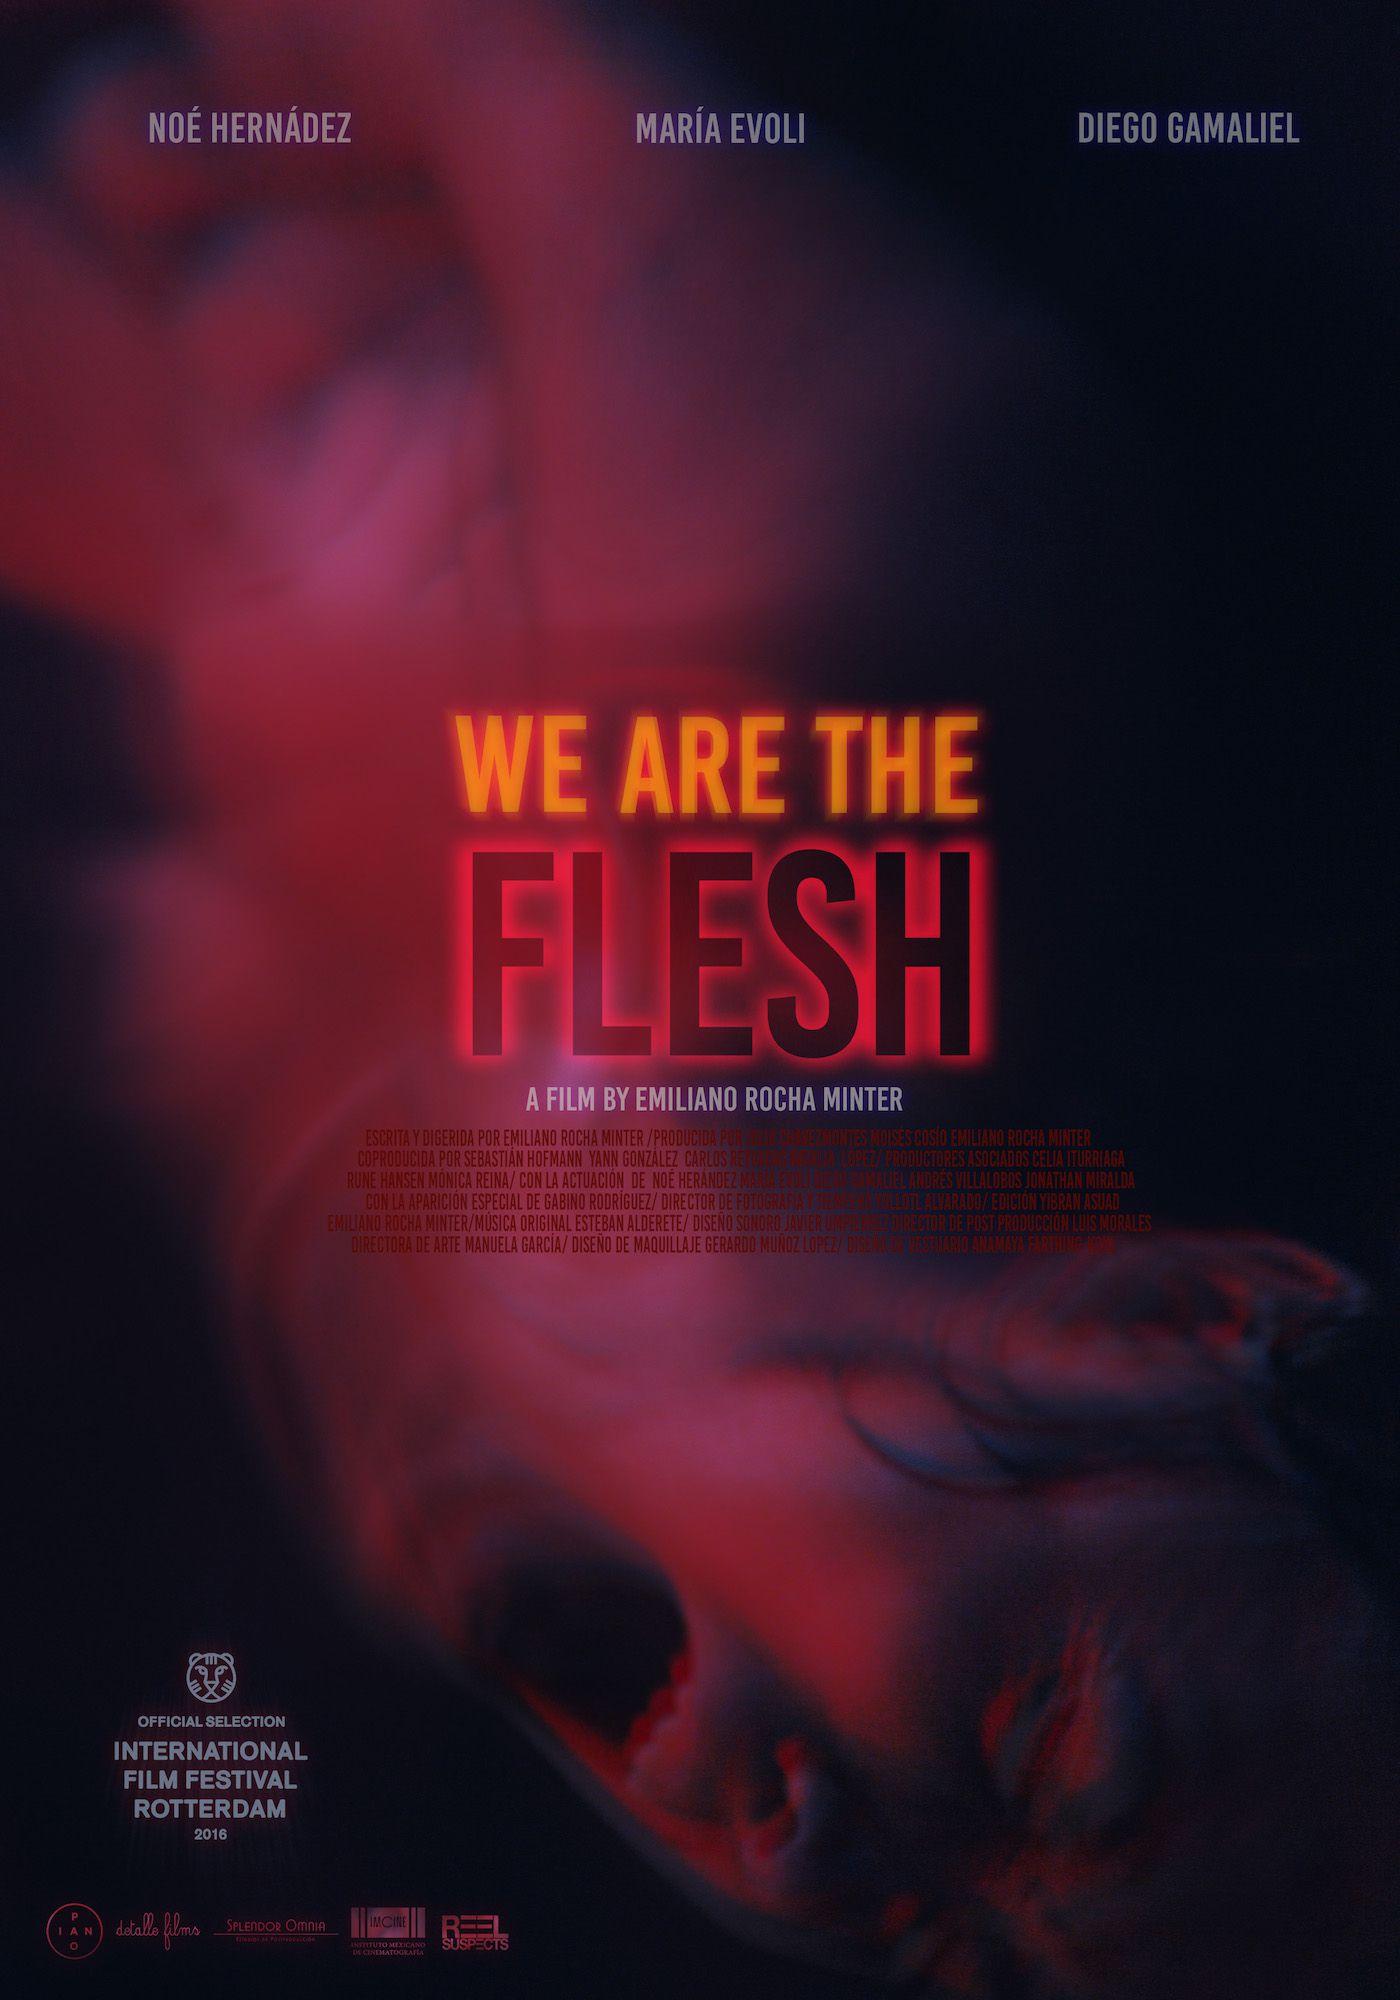 We are the Flesh - Film (2016)